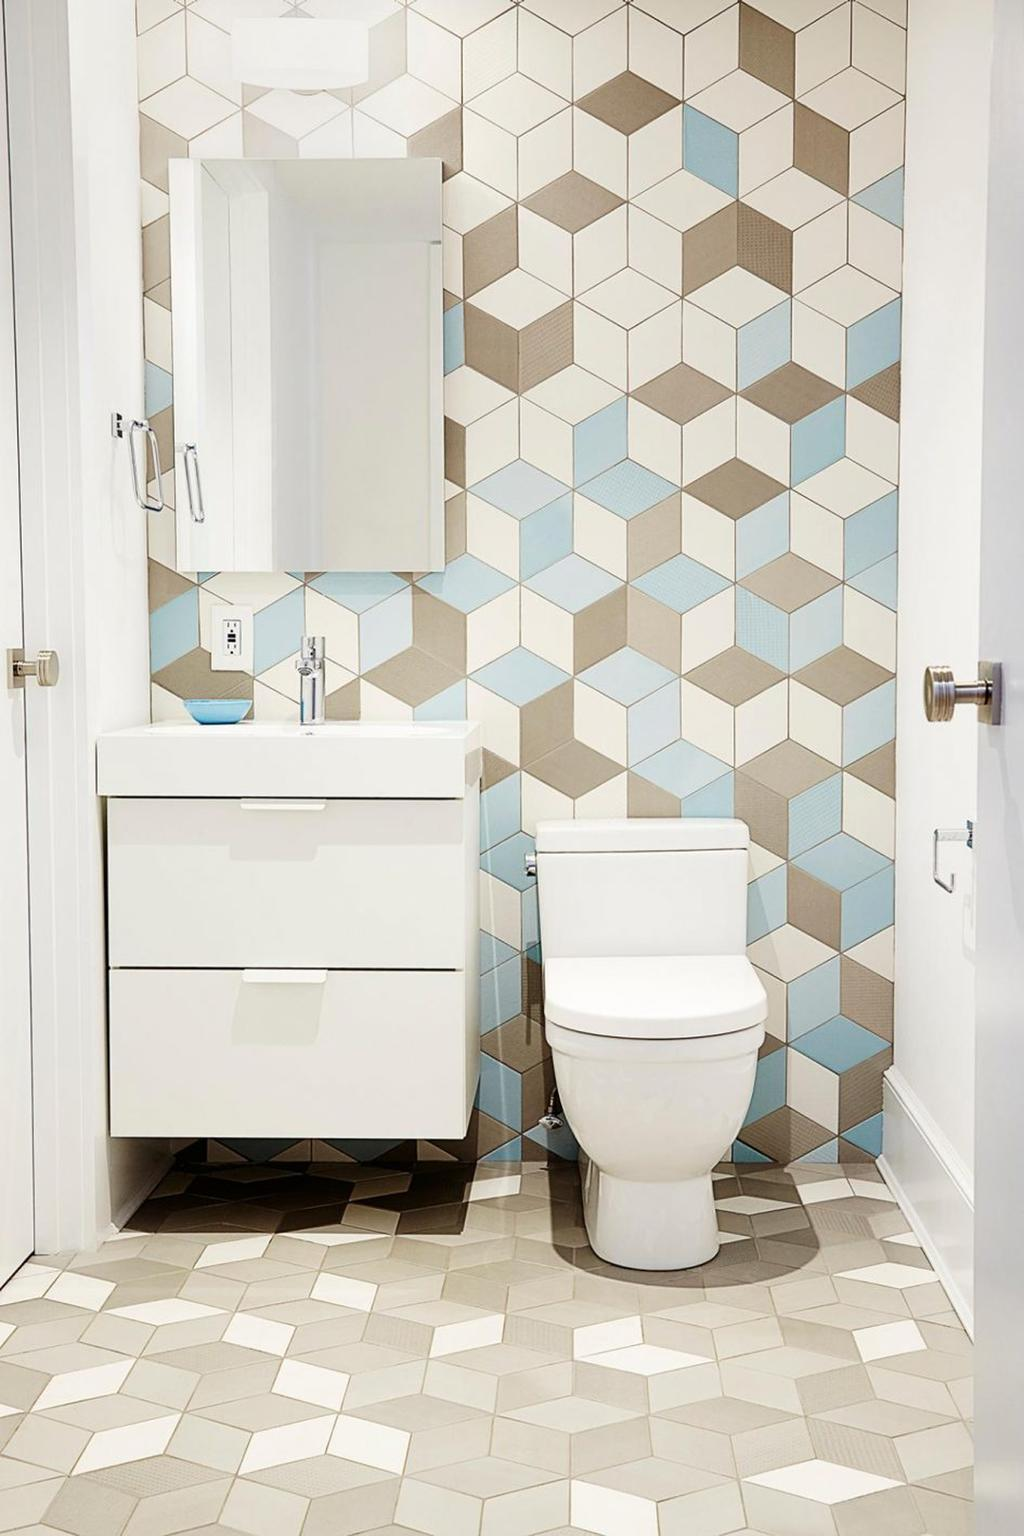 install-dual-flush-toilet